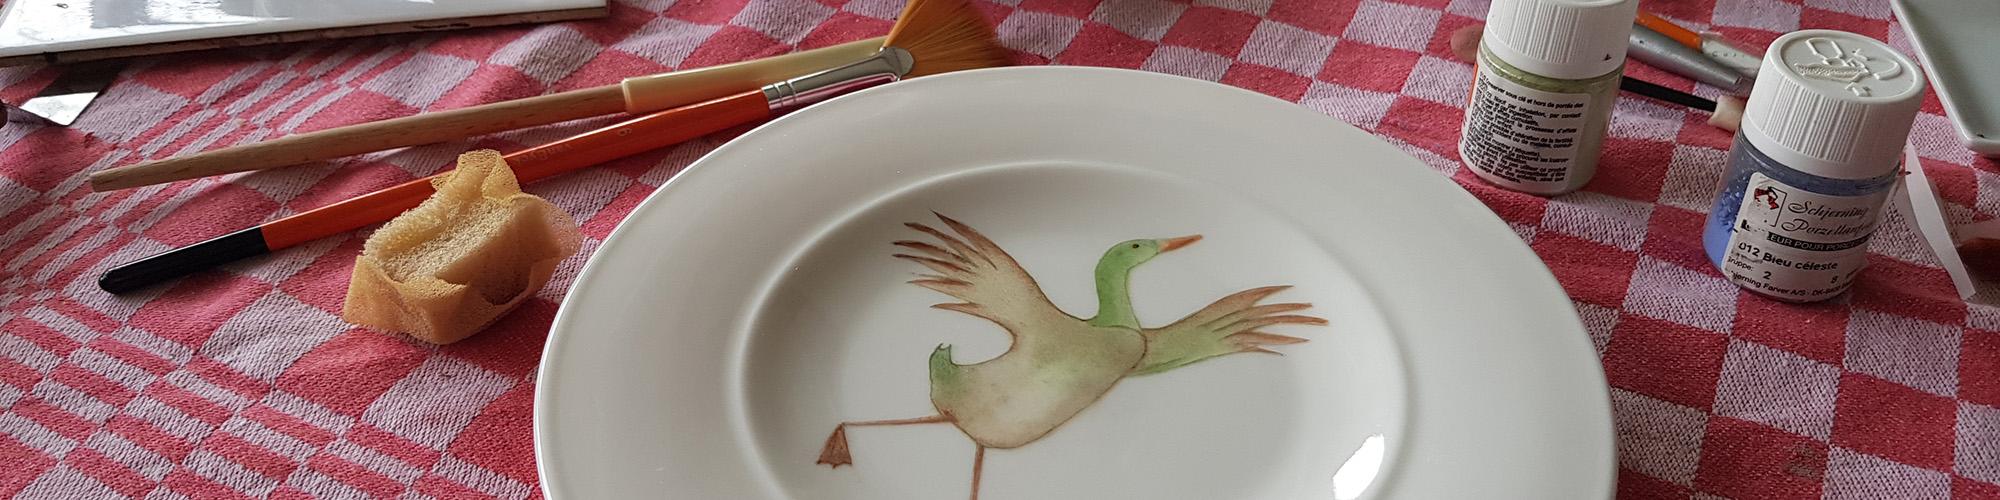 pauline handbeschilderd porselein